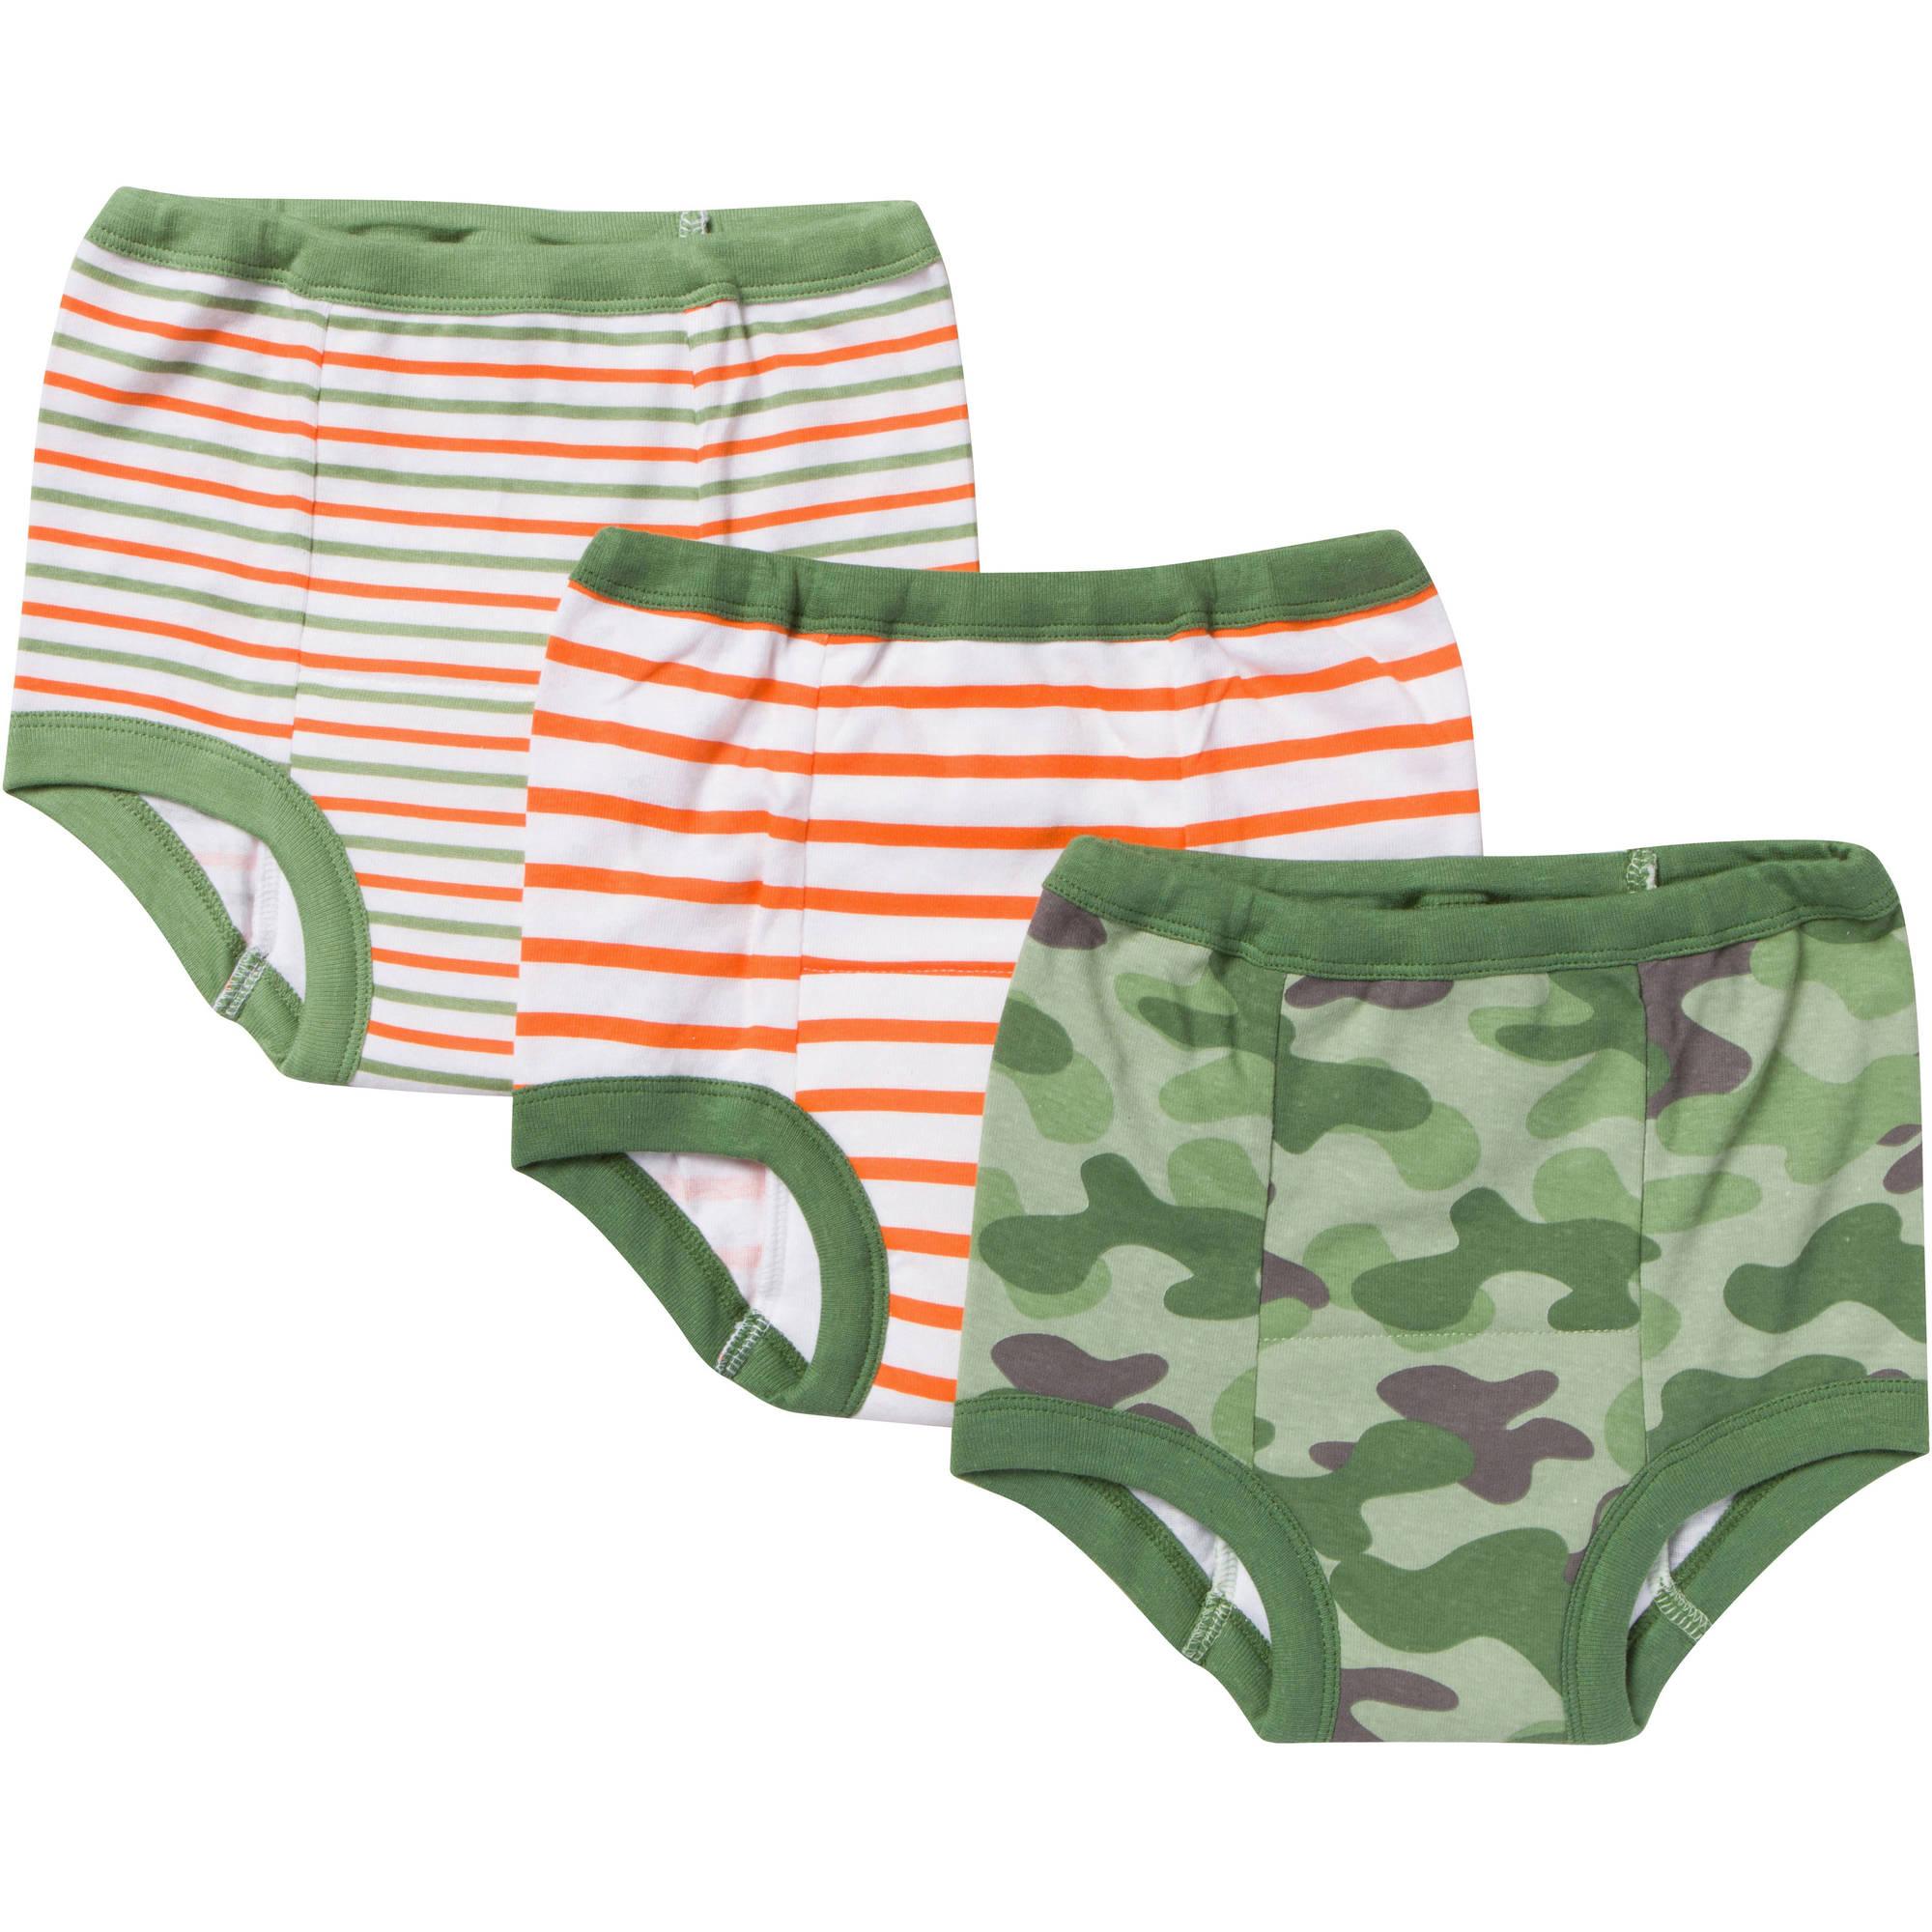 Gerber Toddler Boy's Assorted Training Pants, 3-Pack